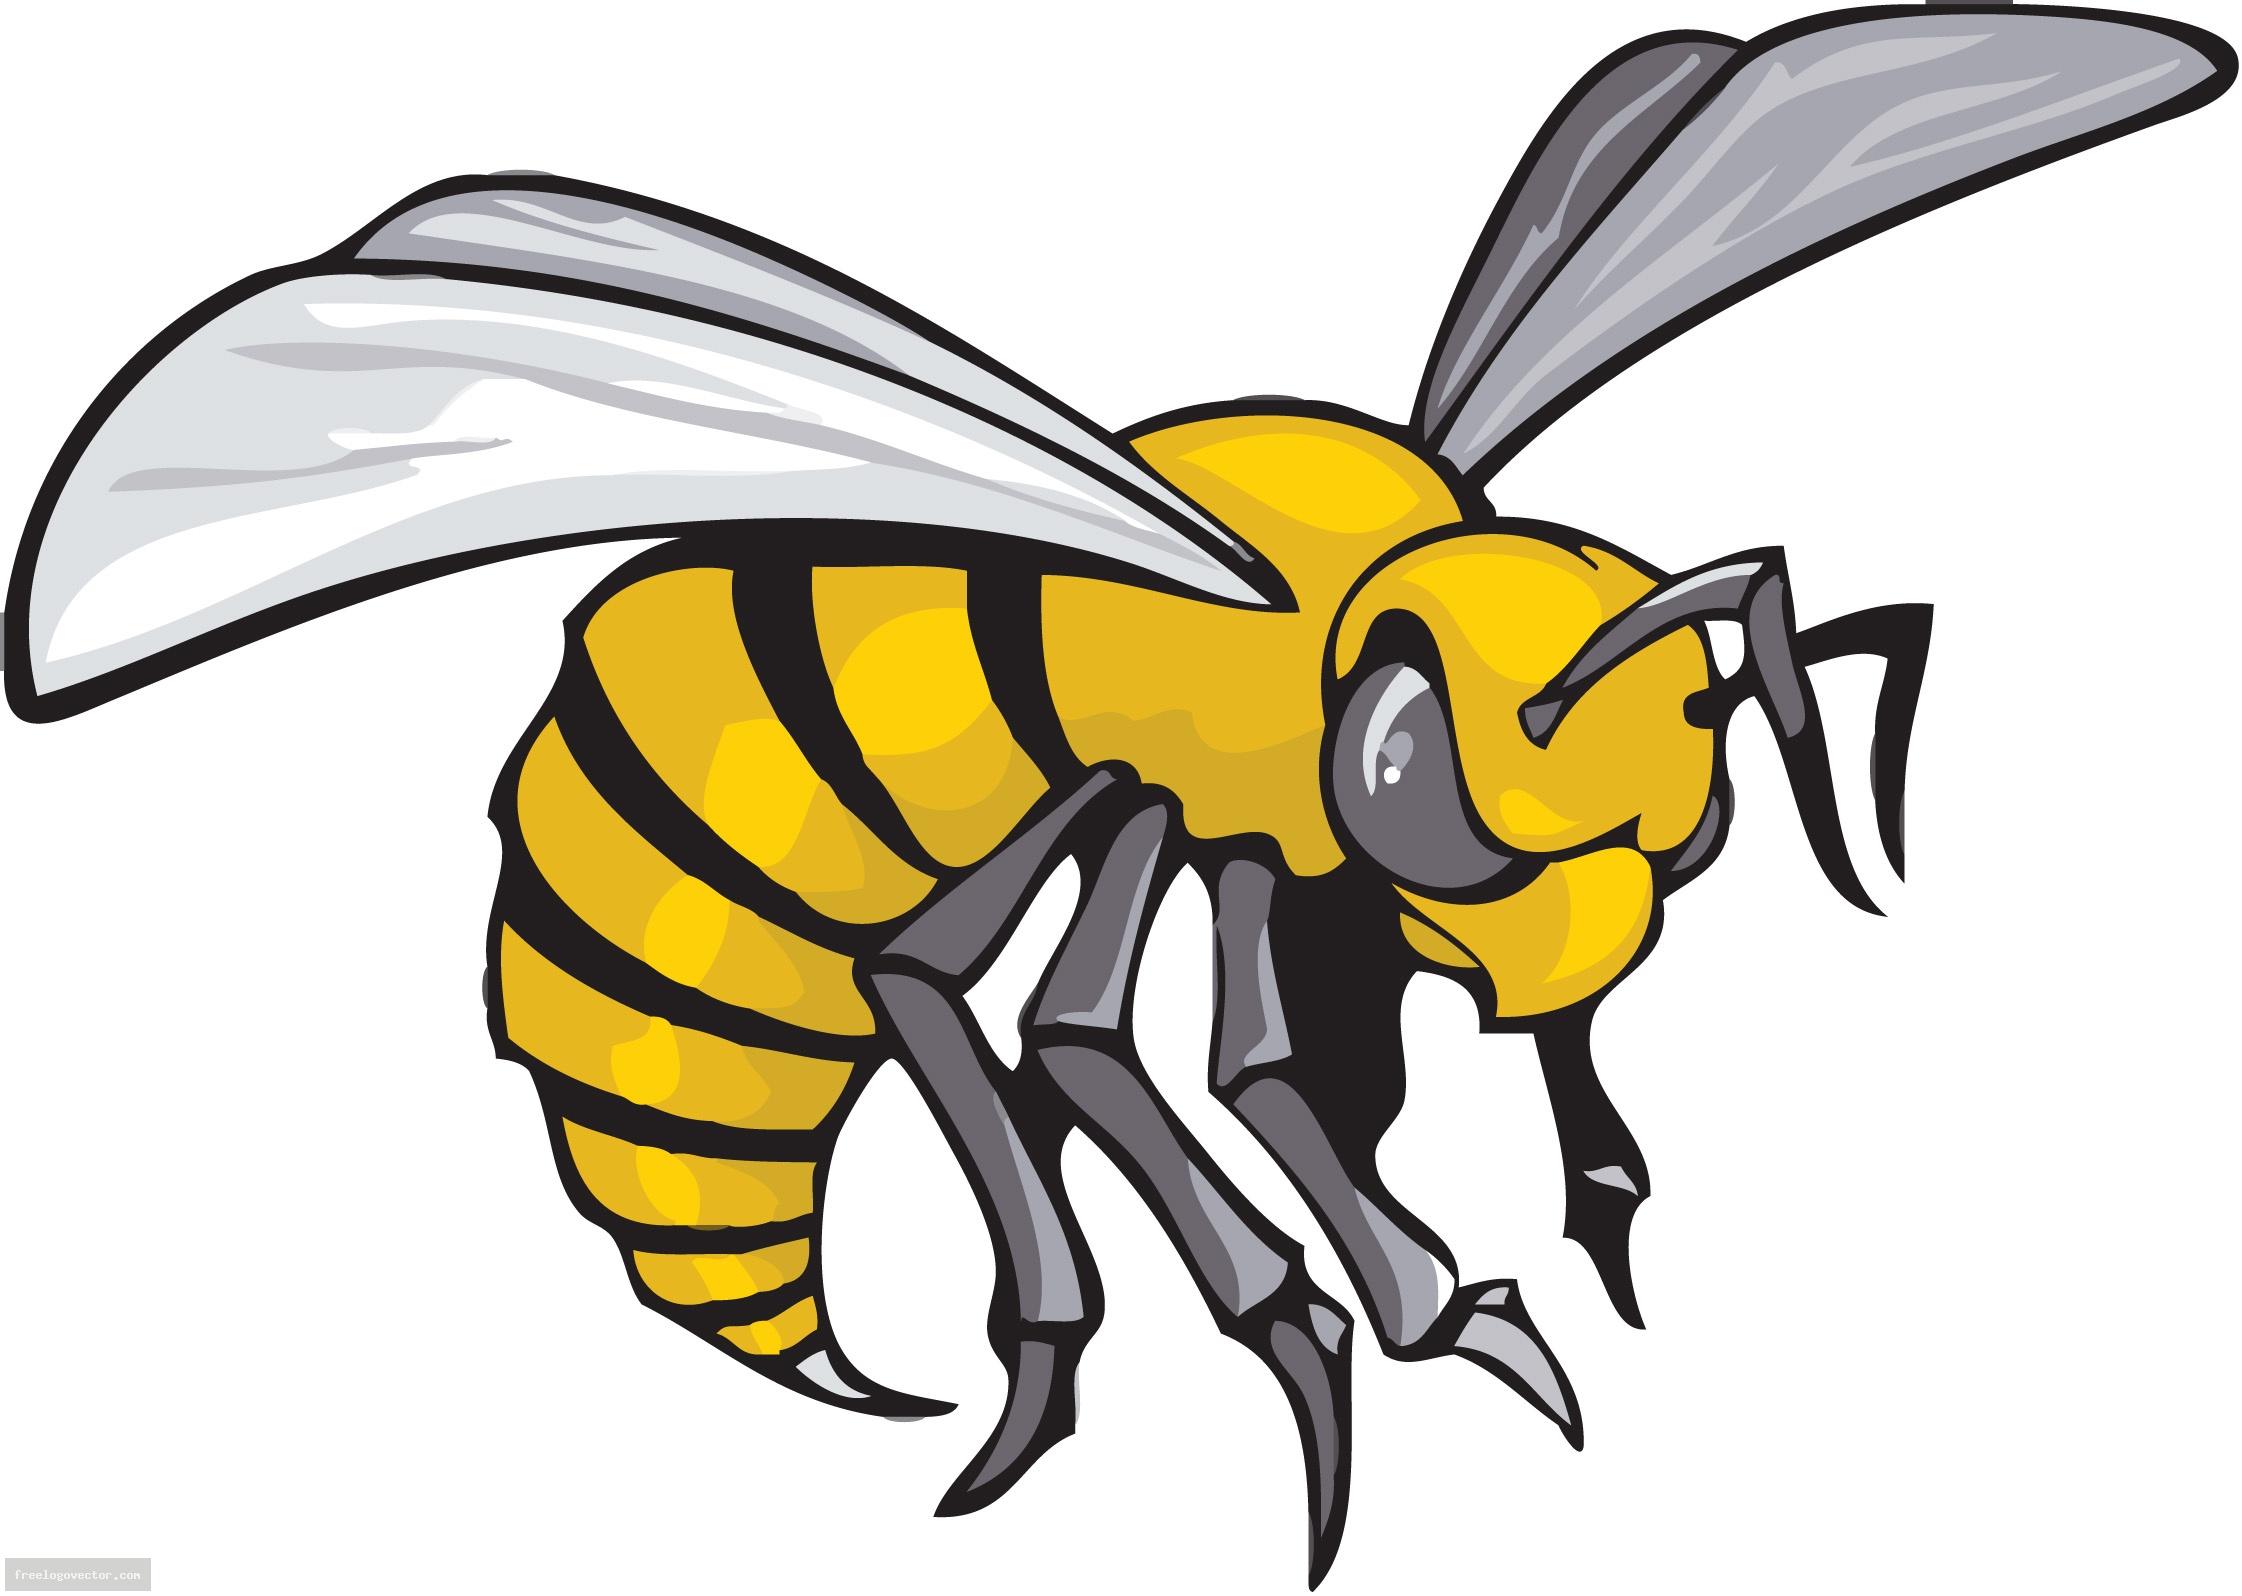 Wasp clipart Art Art WikiClipArt Clip Savoronmorehead